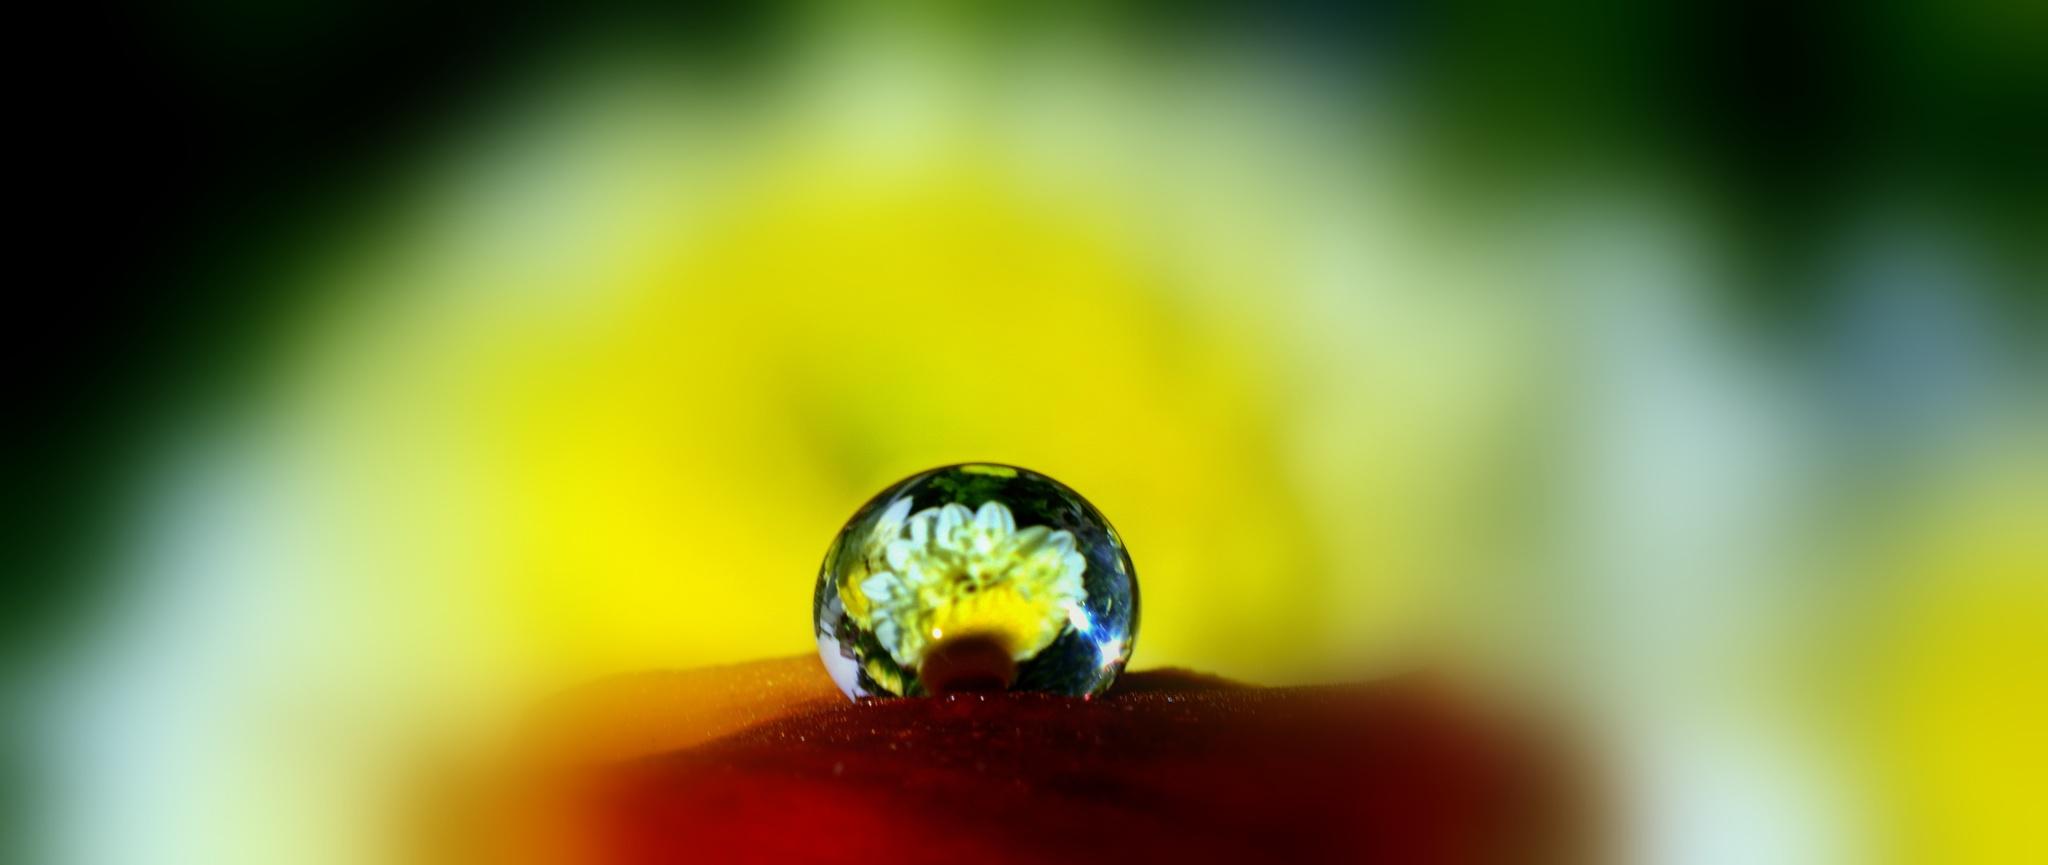 reflection by azeemiclicks